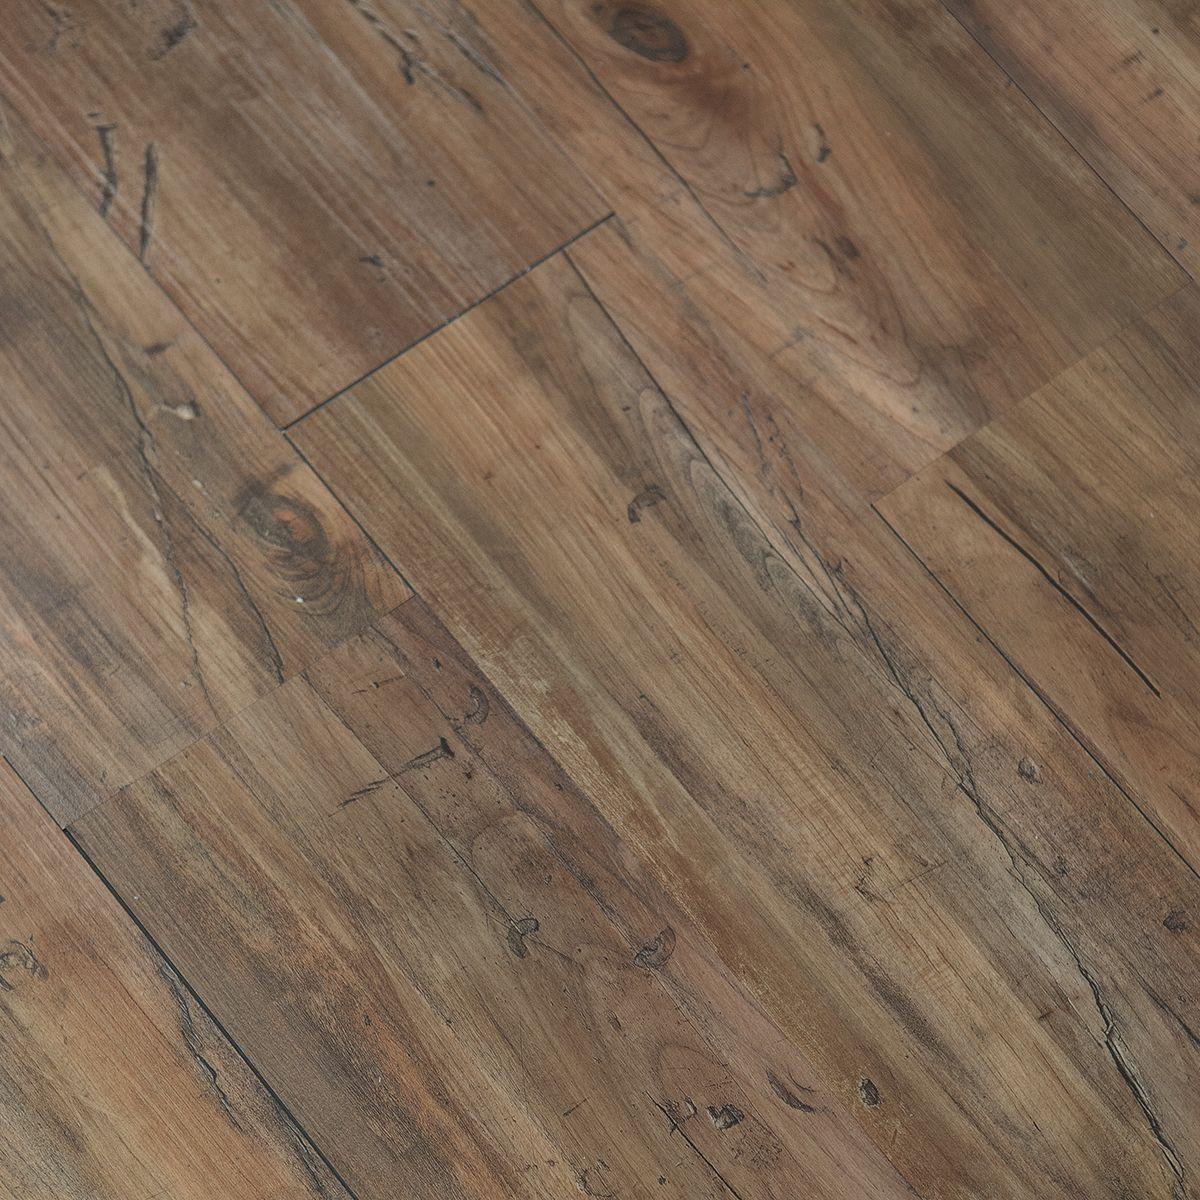 Vineyard Mm Sq Ft Vinyl Plank Flooring Square Feet - How to measure for vinyl plank flooring